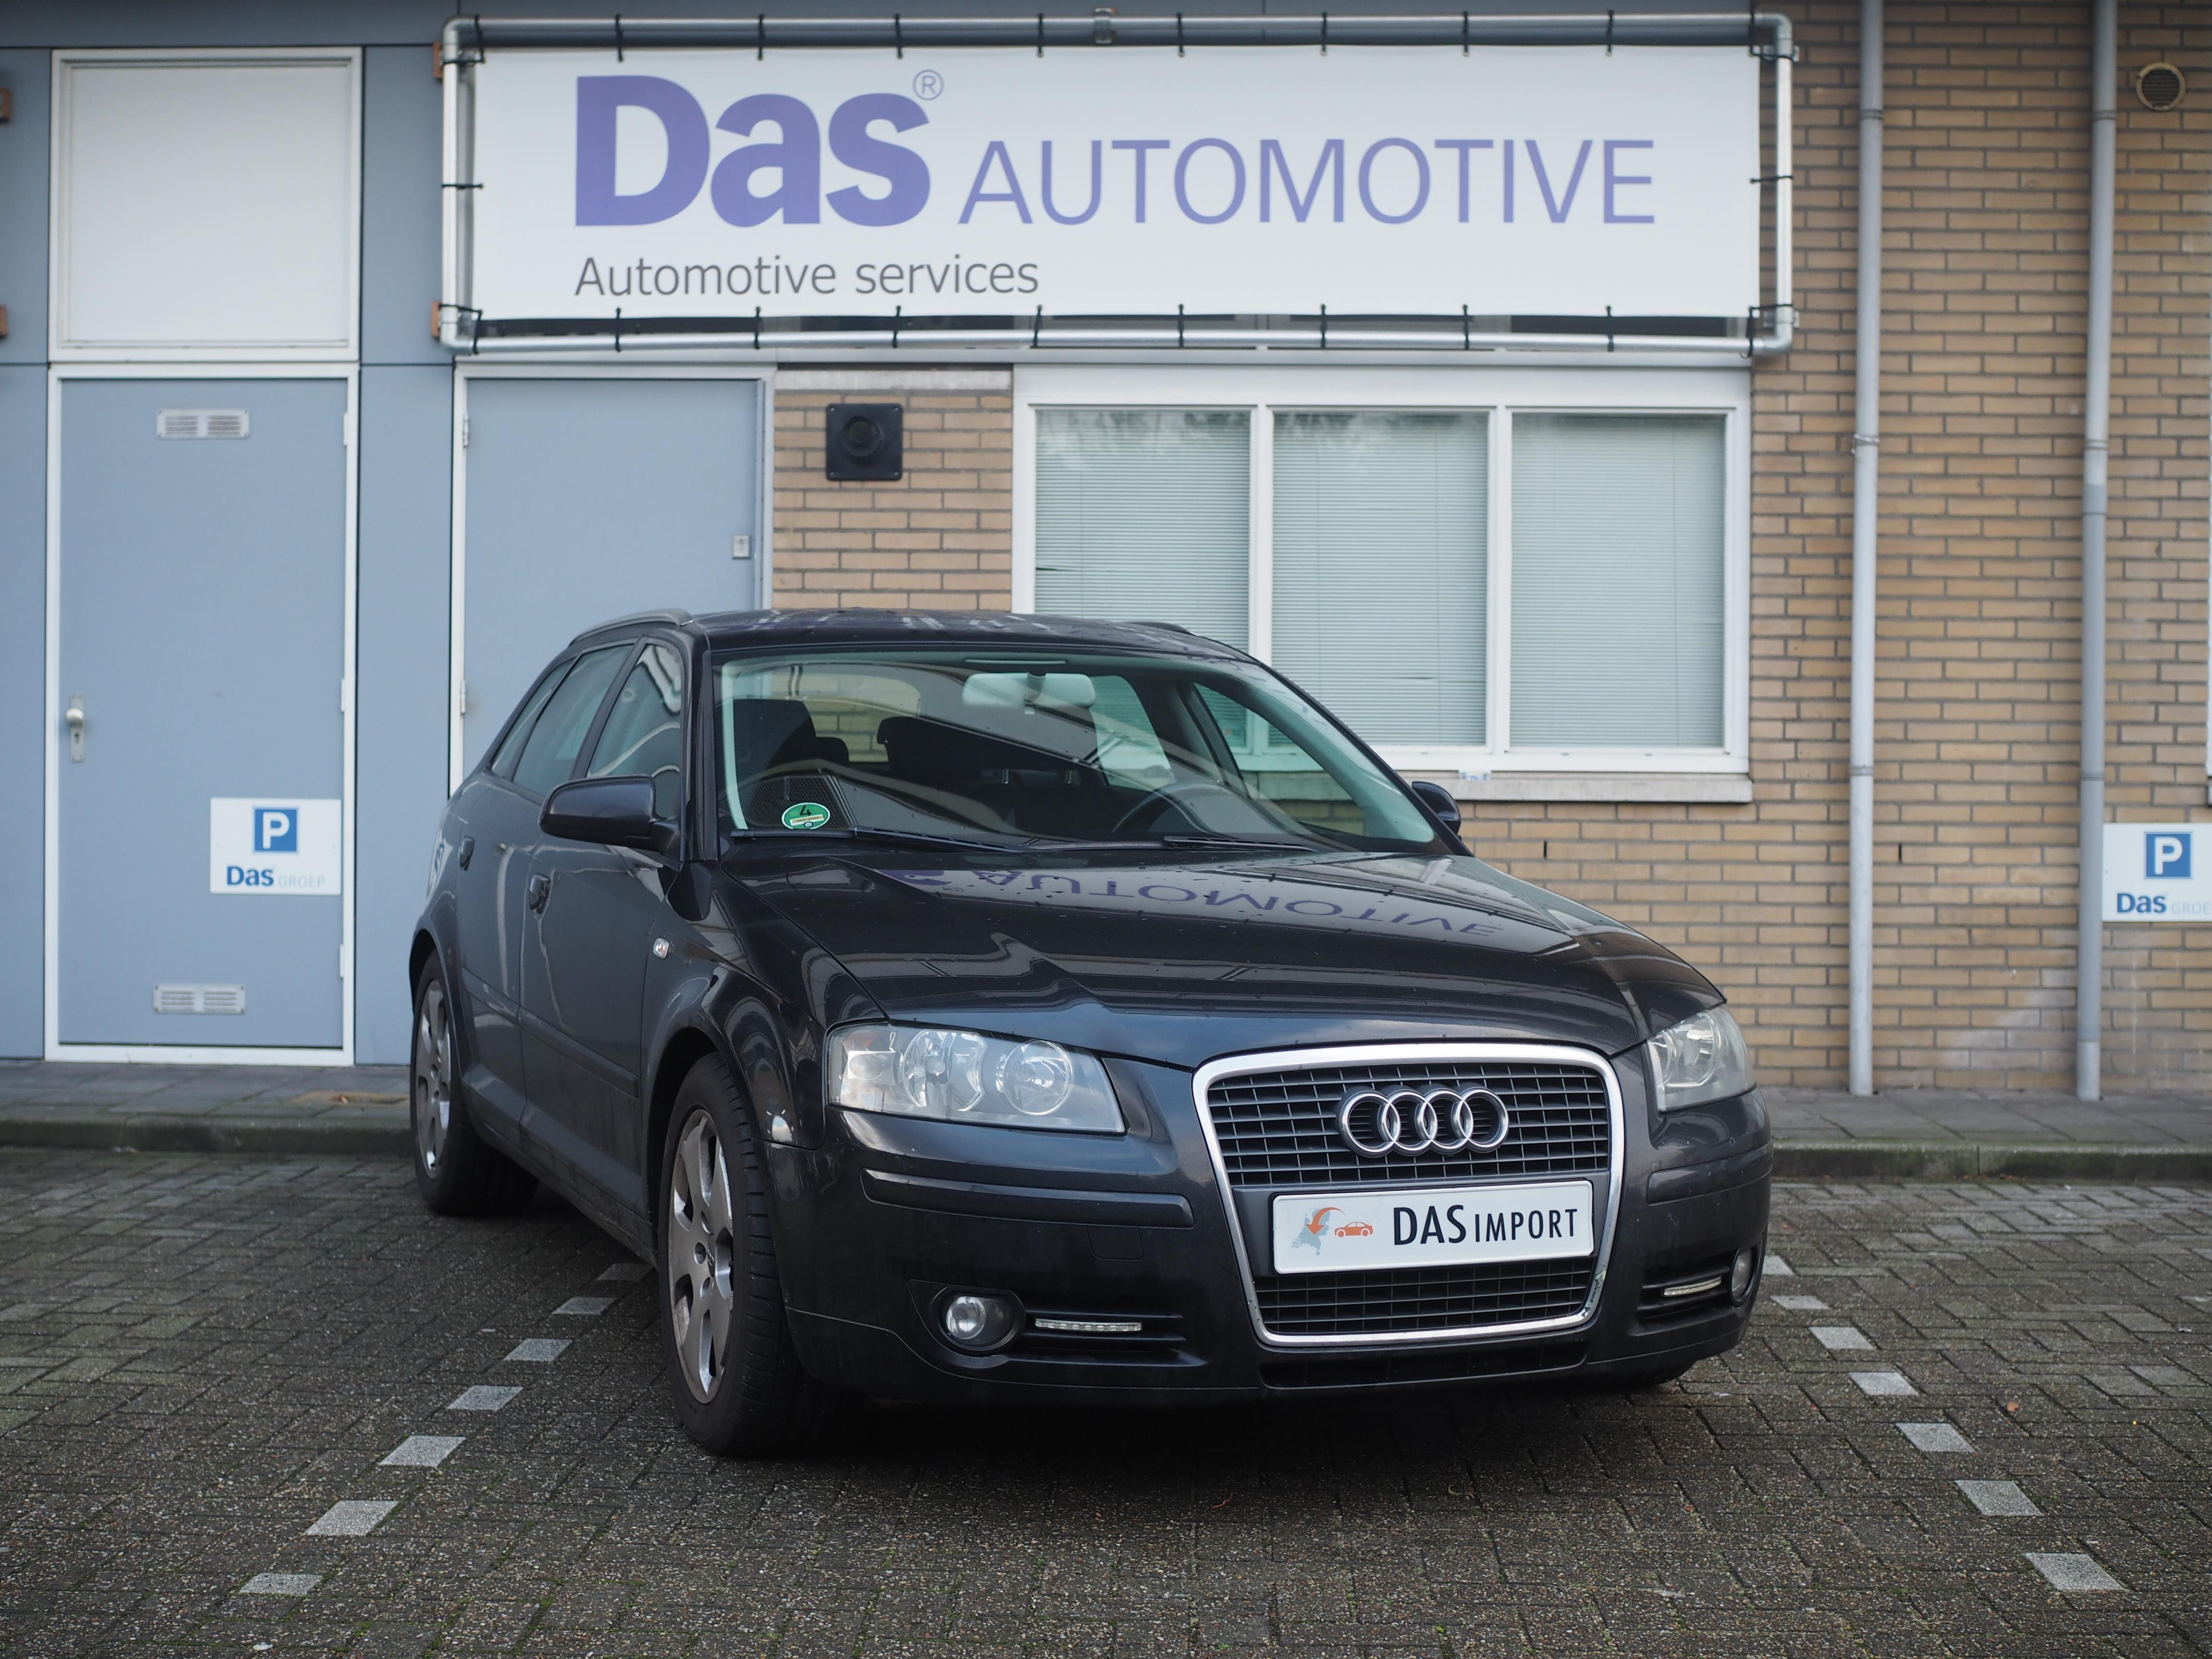 Importauto: Audi  A3 Sportback Diesel 2.0 TDI 3/2007